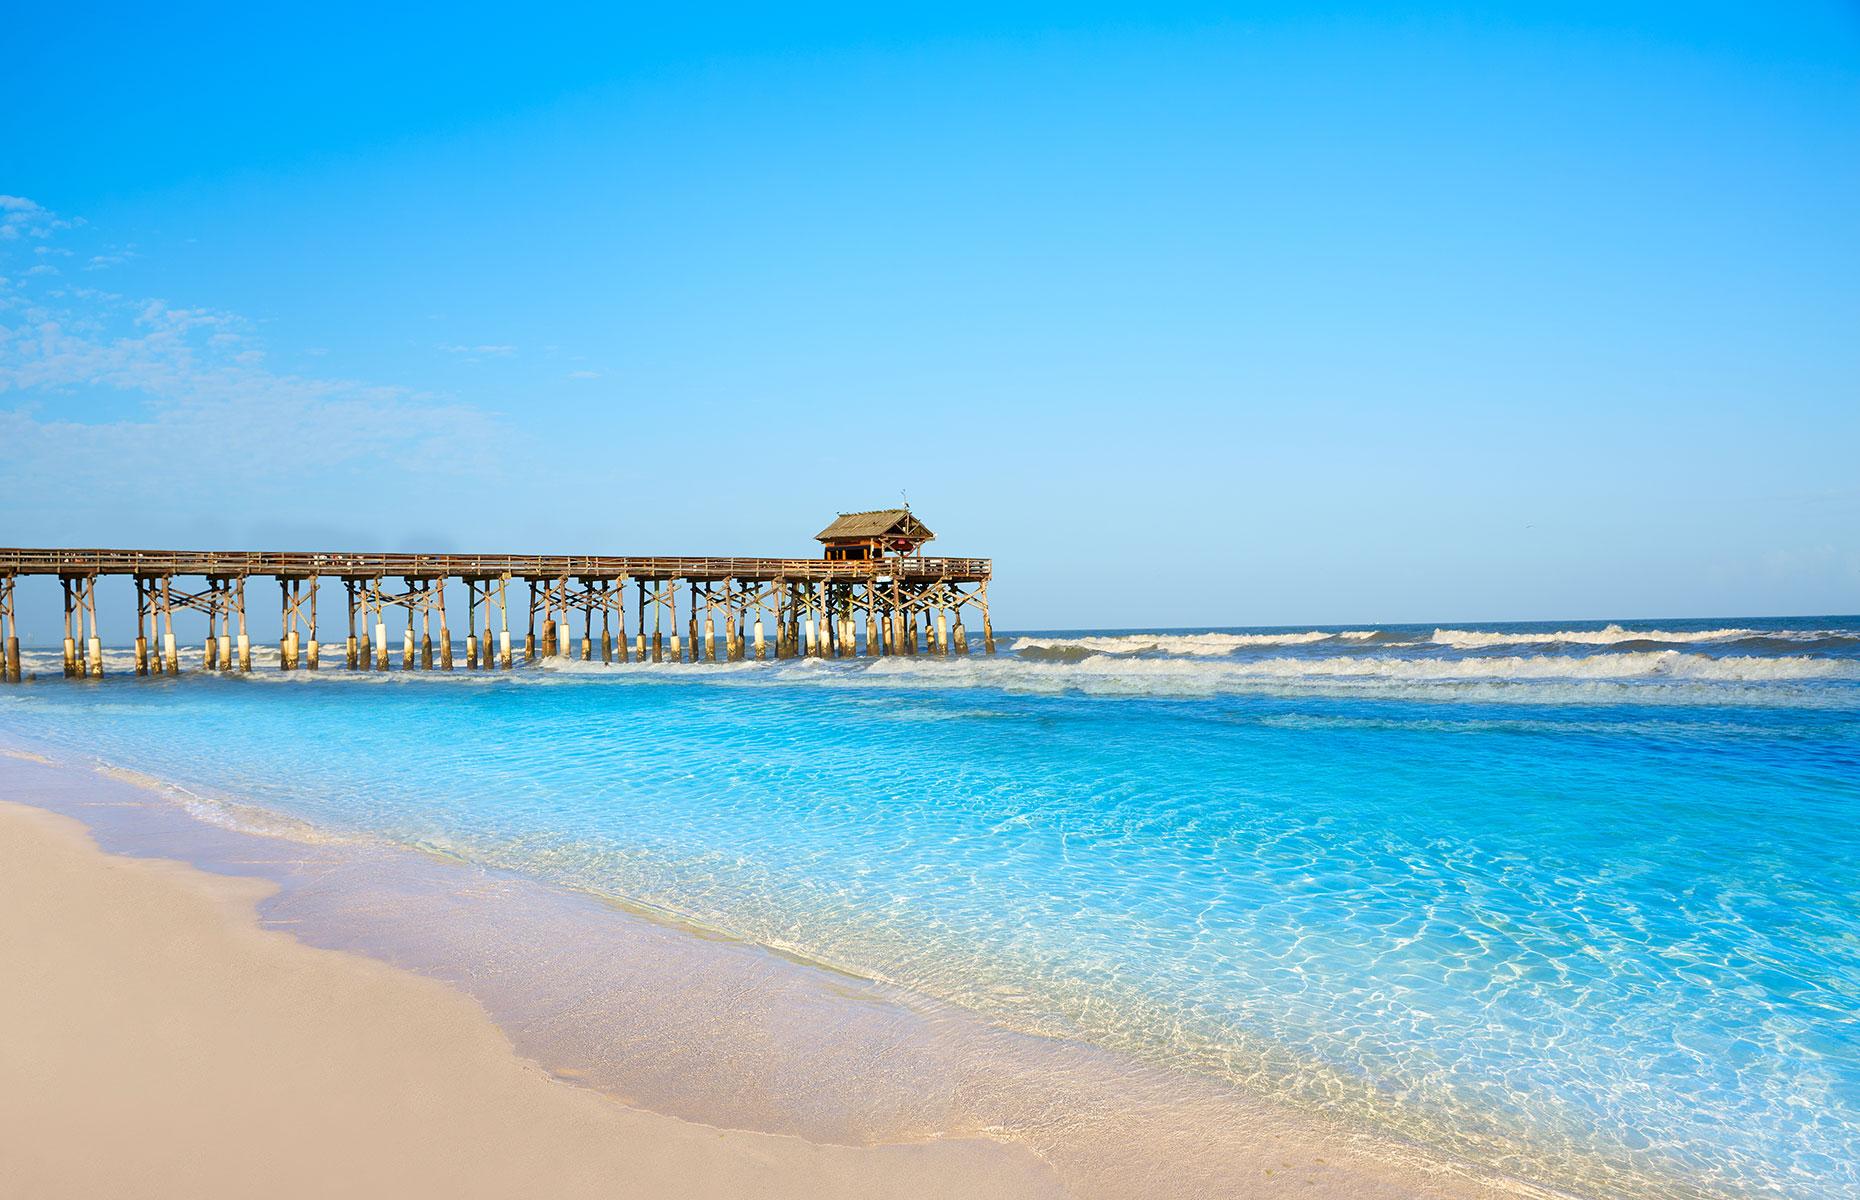 Cocoa Beach, Florida (Image: lunamarina/Shutterstock)